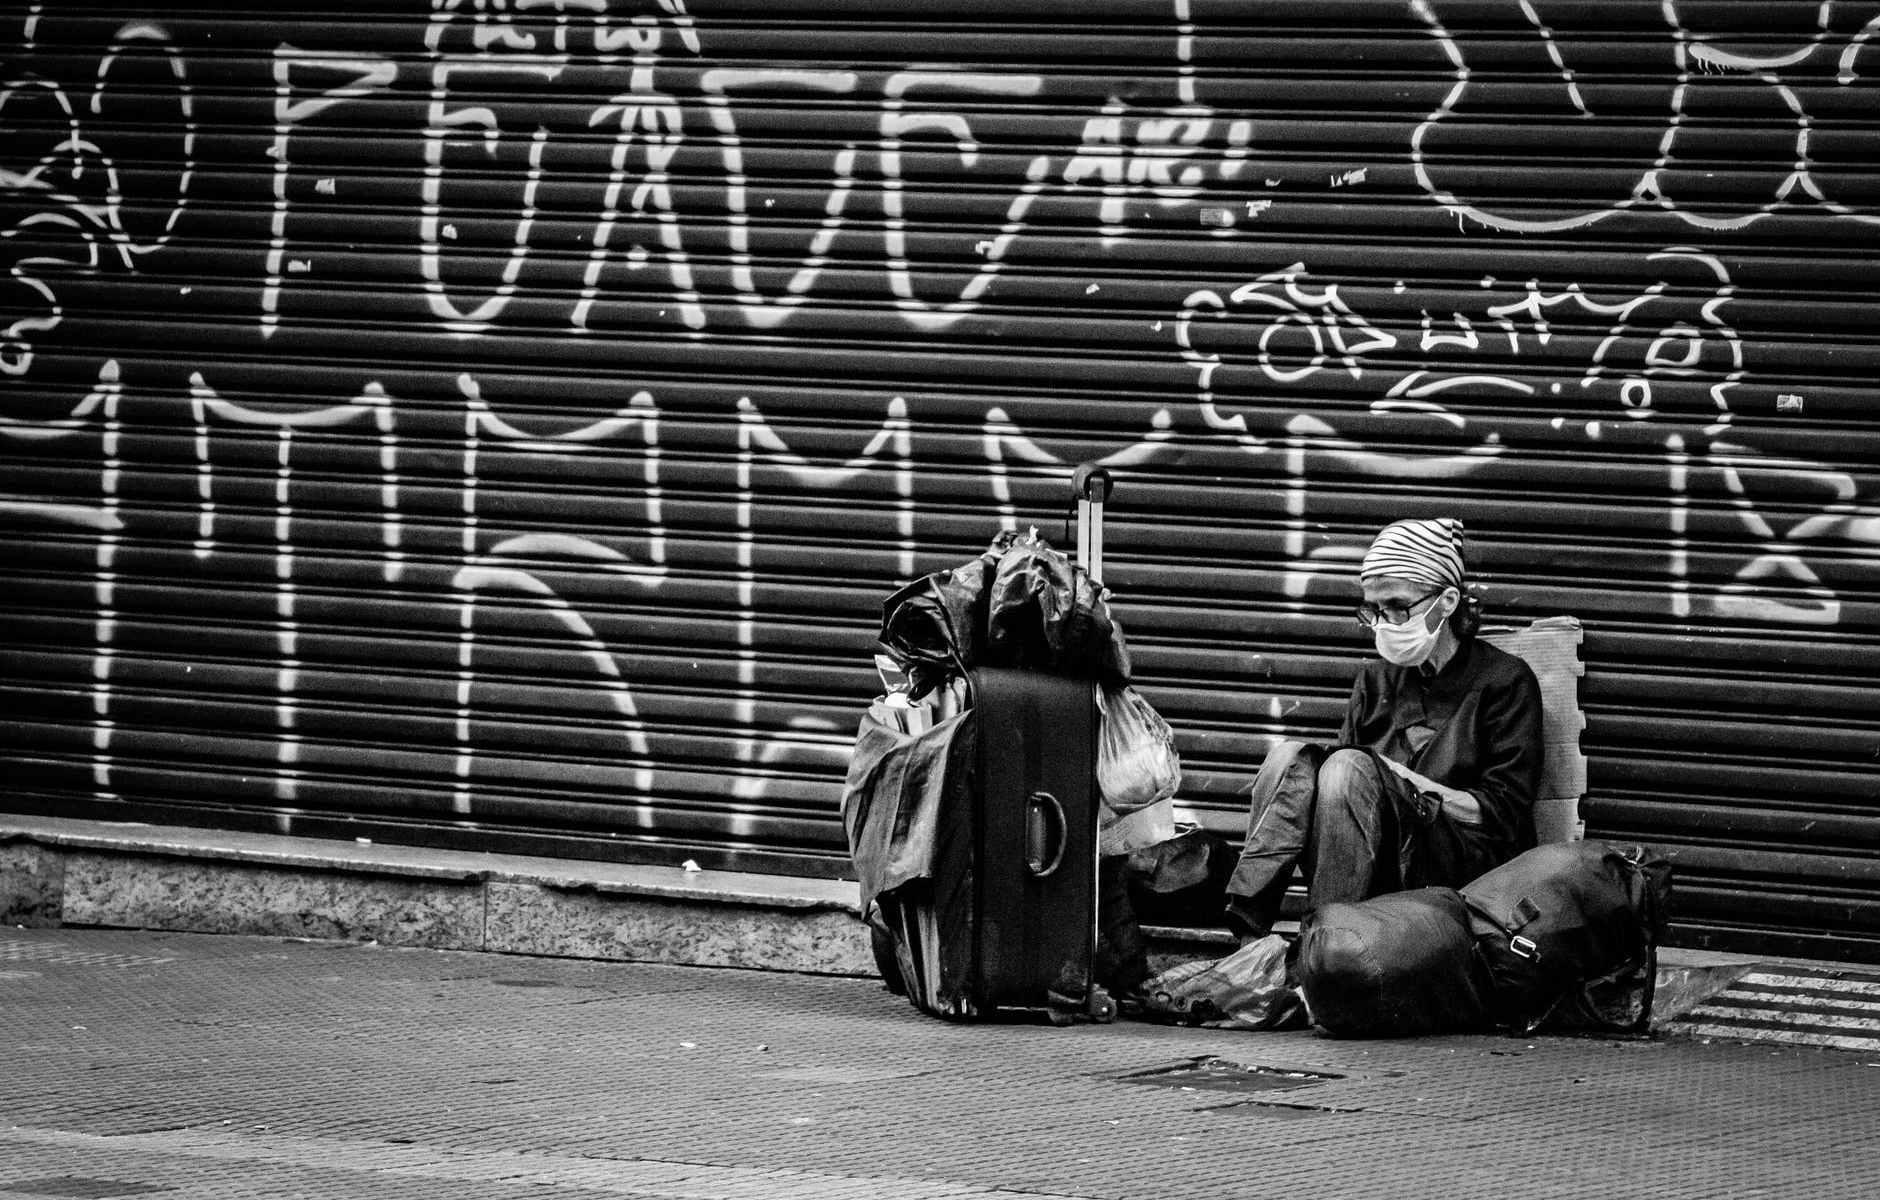 donne-serranda-graffiti-strada